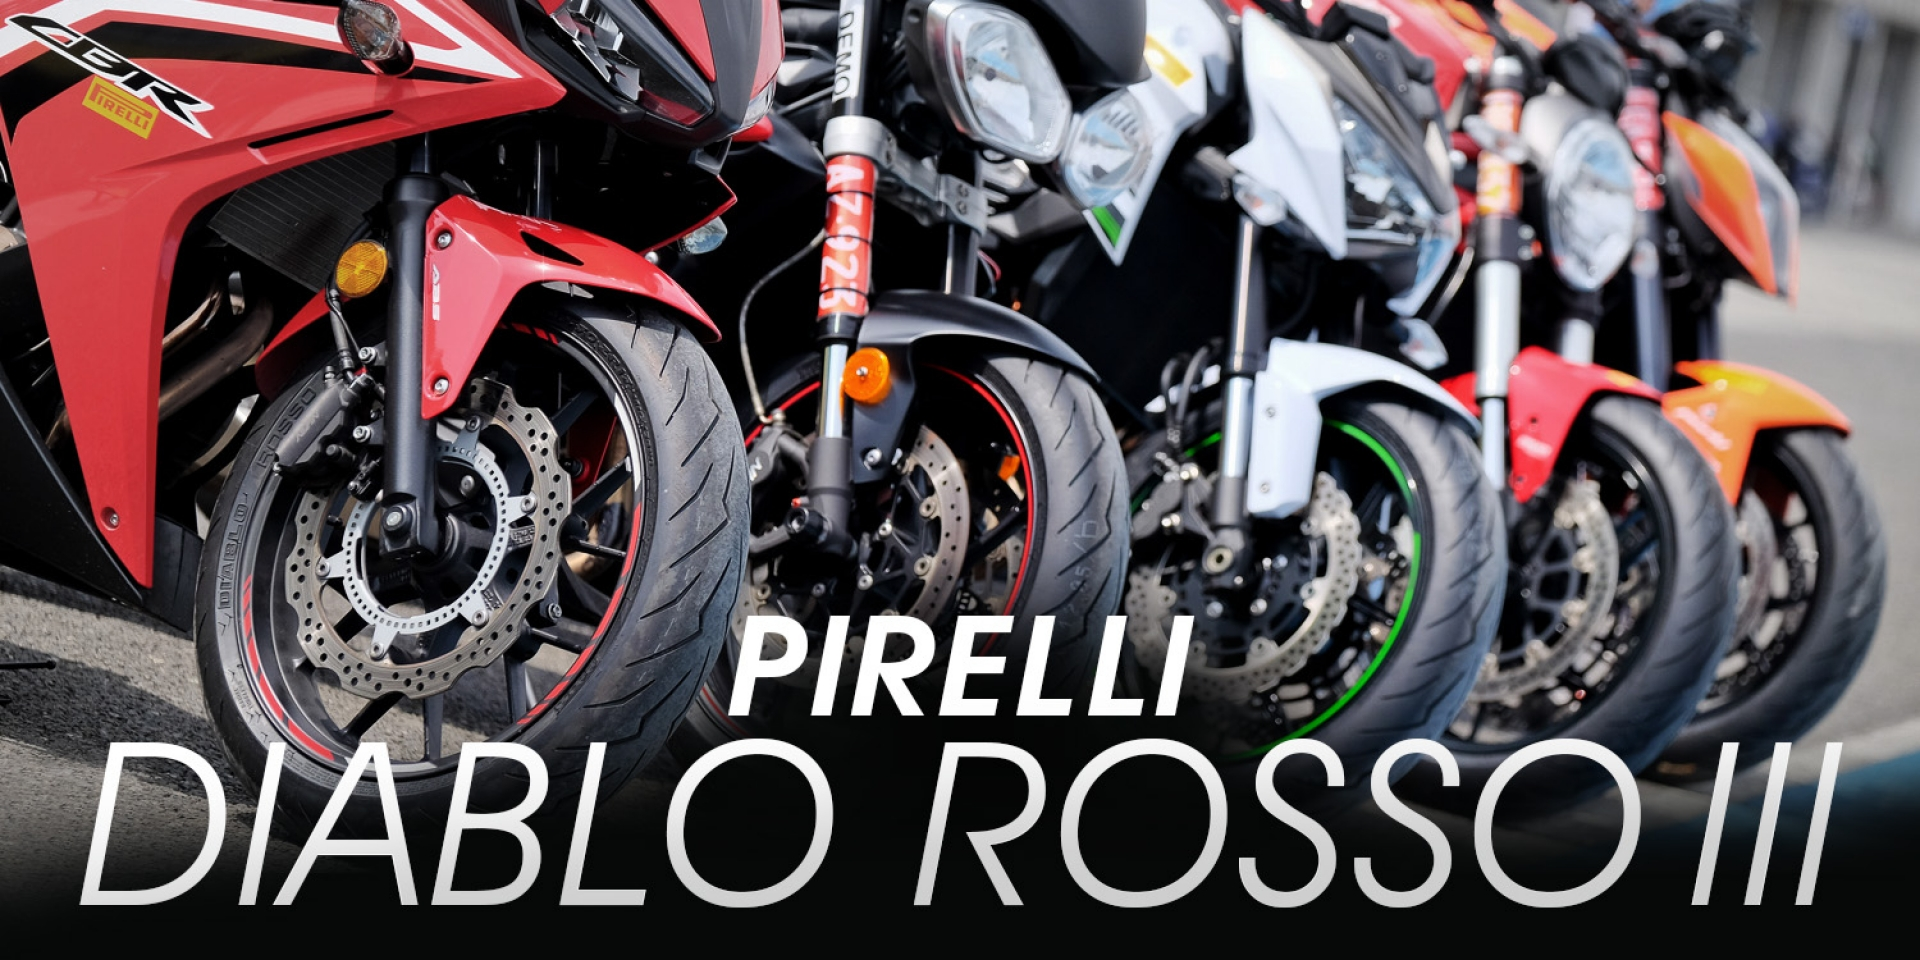 PIRELLI年度賽道盛會。最強街跑胎DIABLO ROSSO III紅閃電,全面剖析